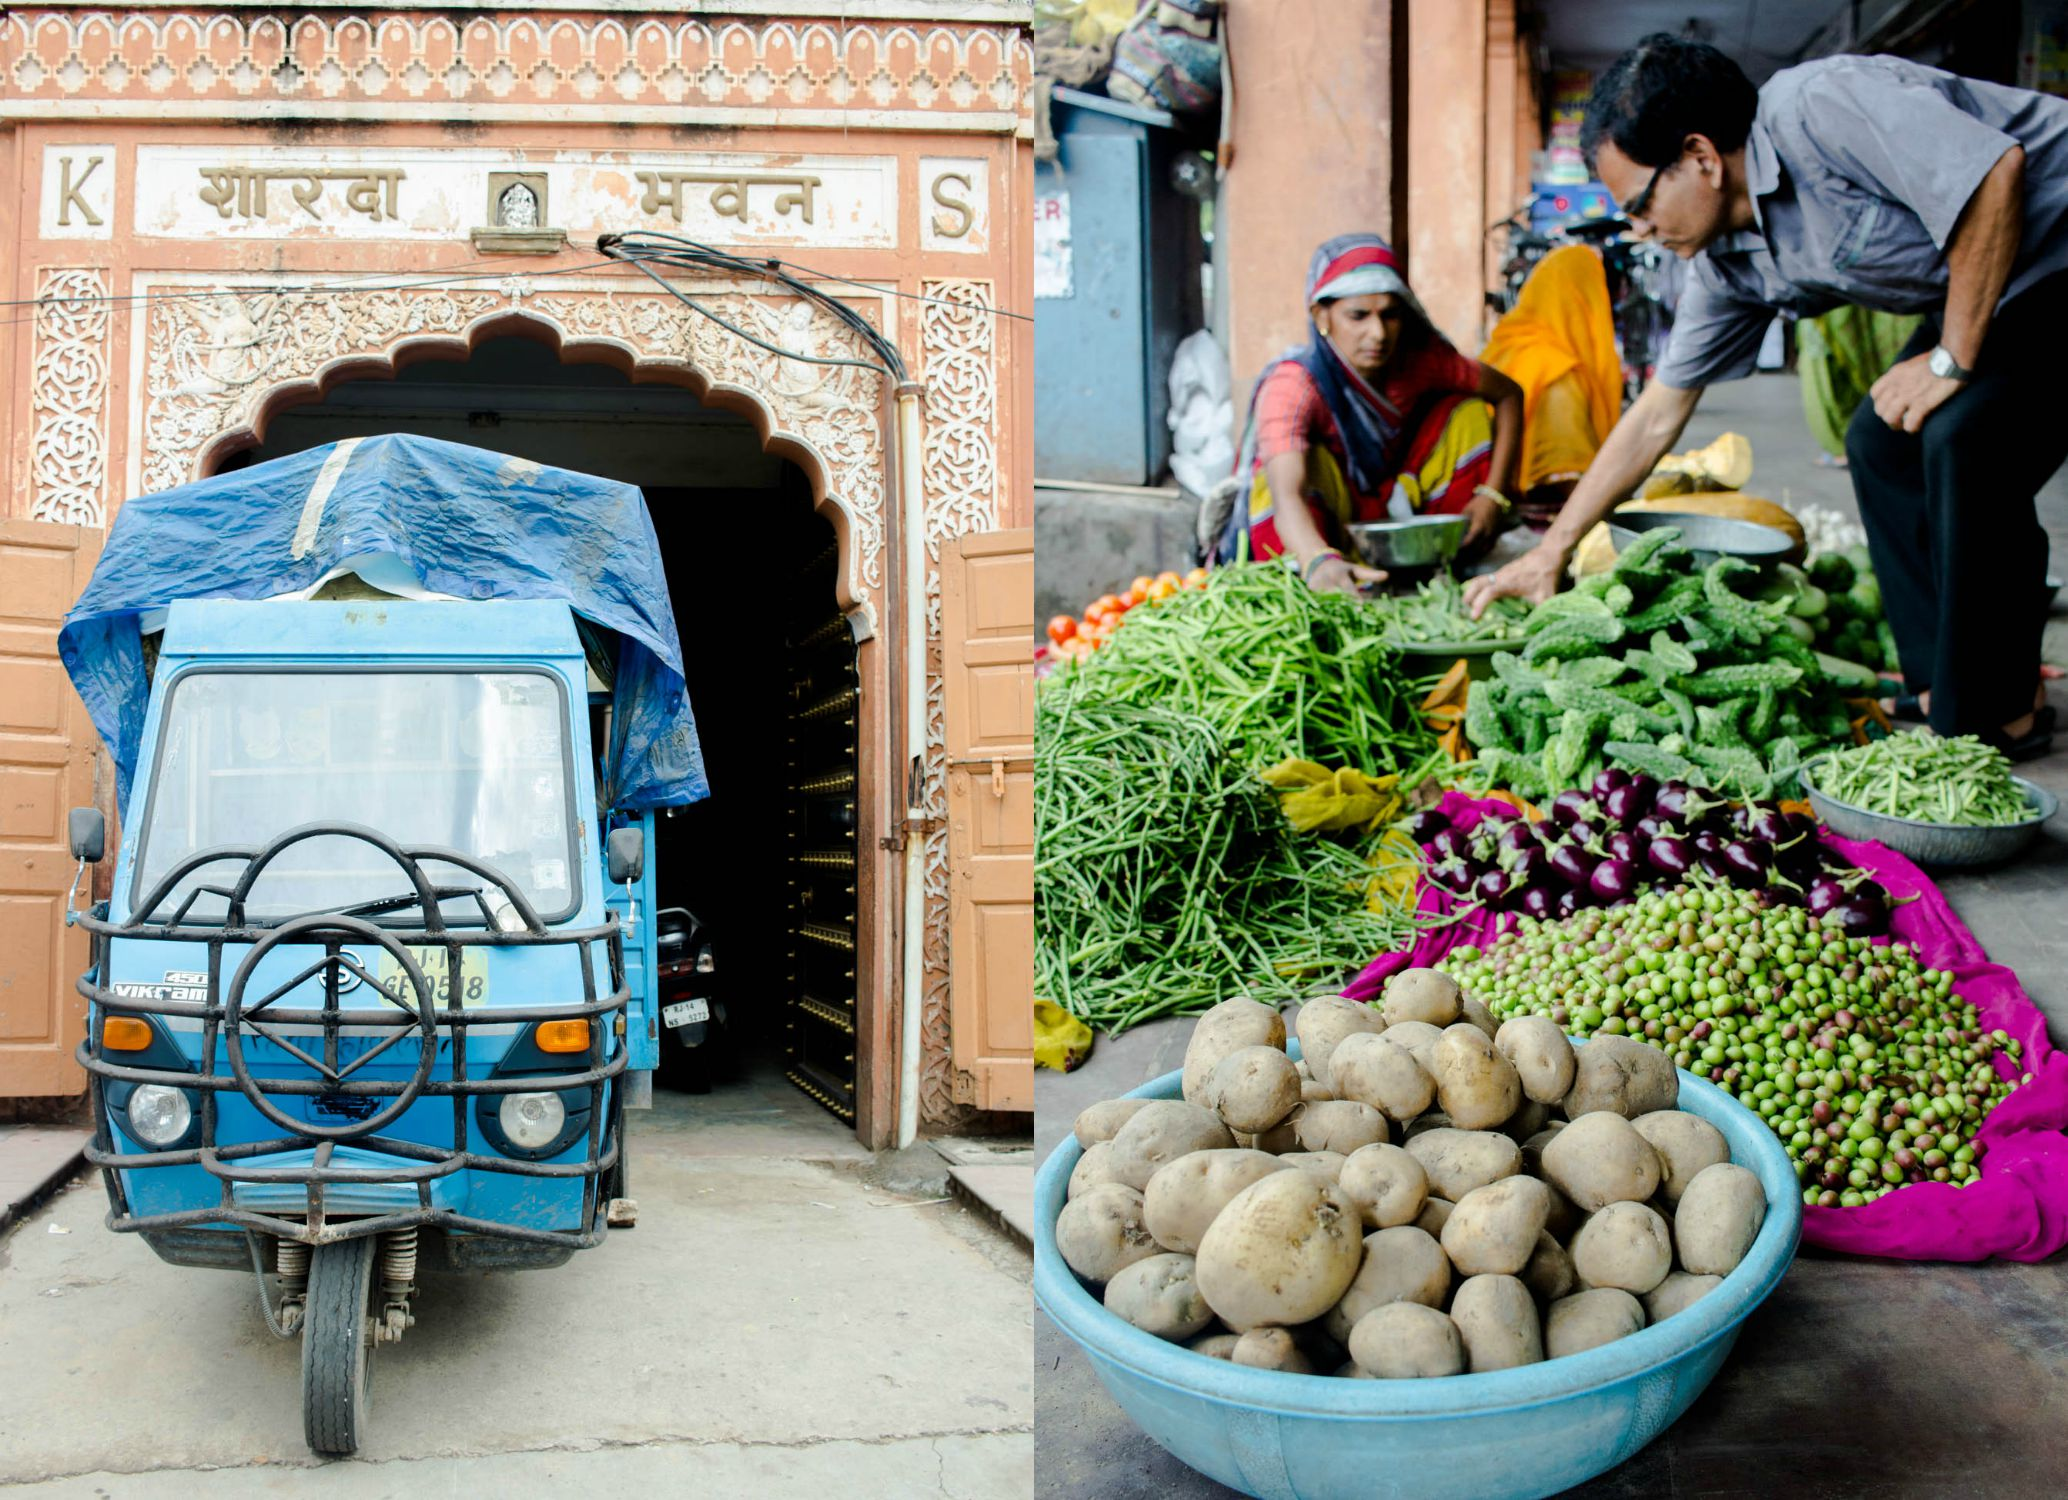 golden triangle rajasthan taj mahal jaipur delhi india tips must see kathi kamleitner travelettes-44